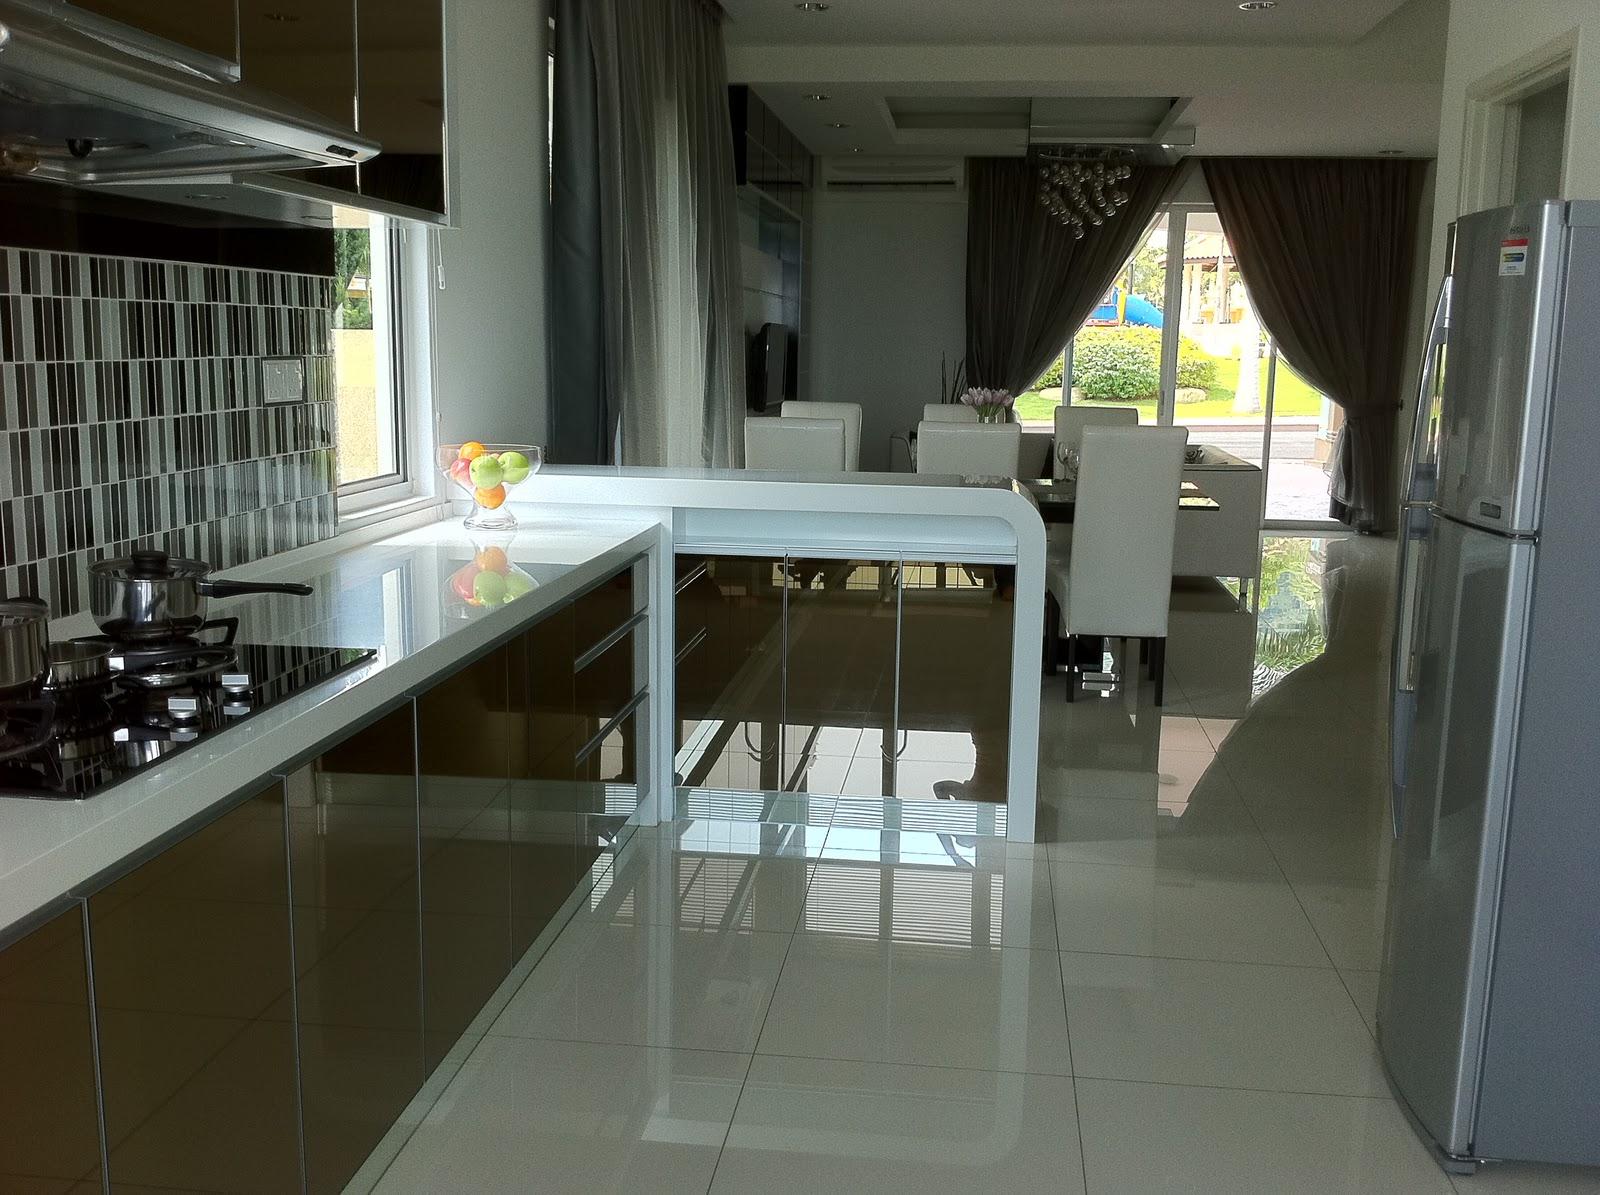 Kos Penentu Harga Kabinet Dapur